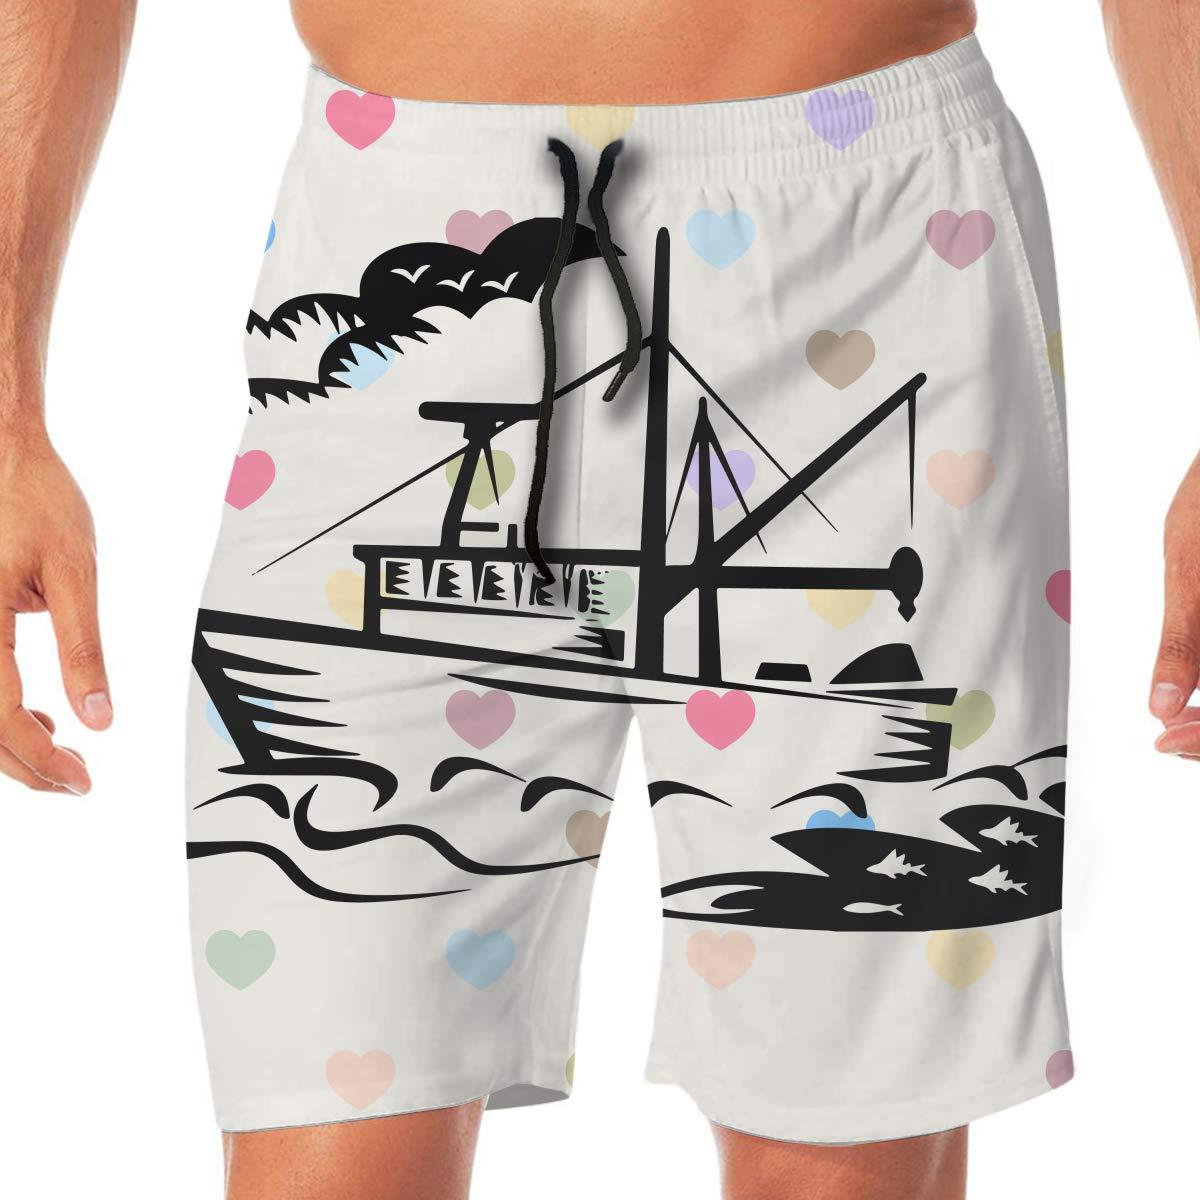 BEAQ45 Fishing Boat Mens Swim Trunks Household Pants Swimming Trunks